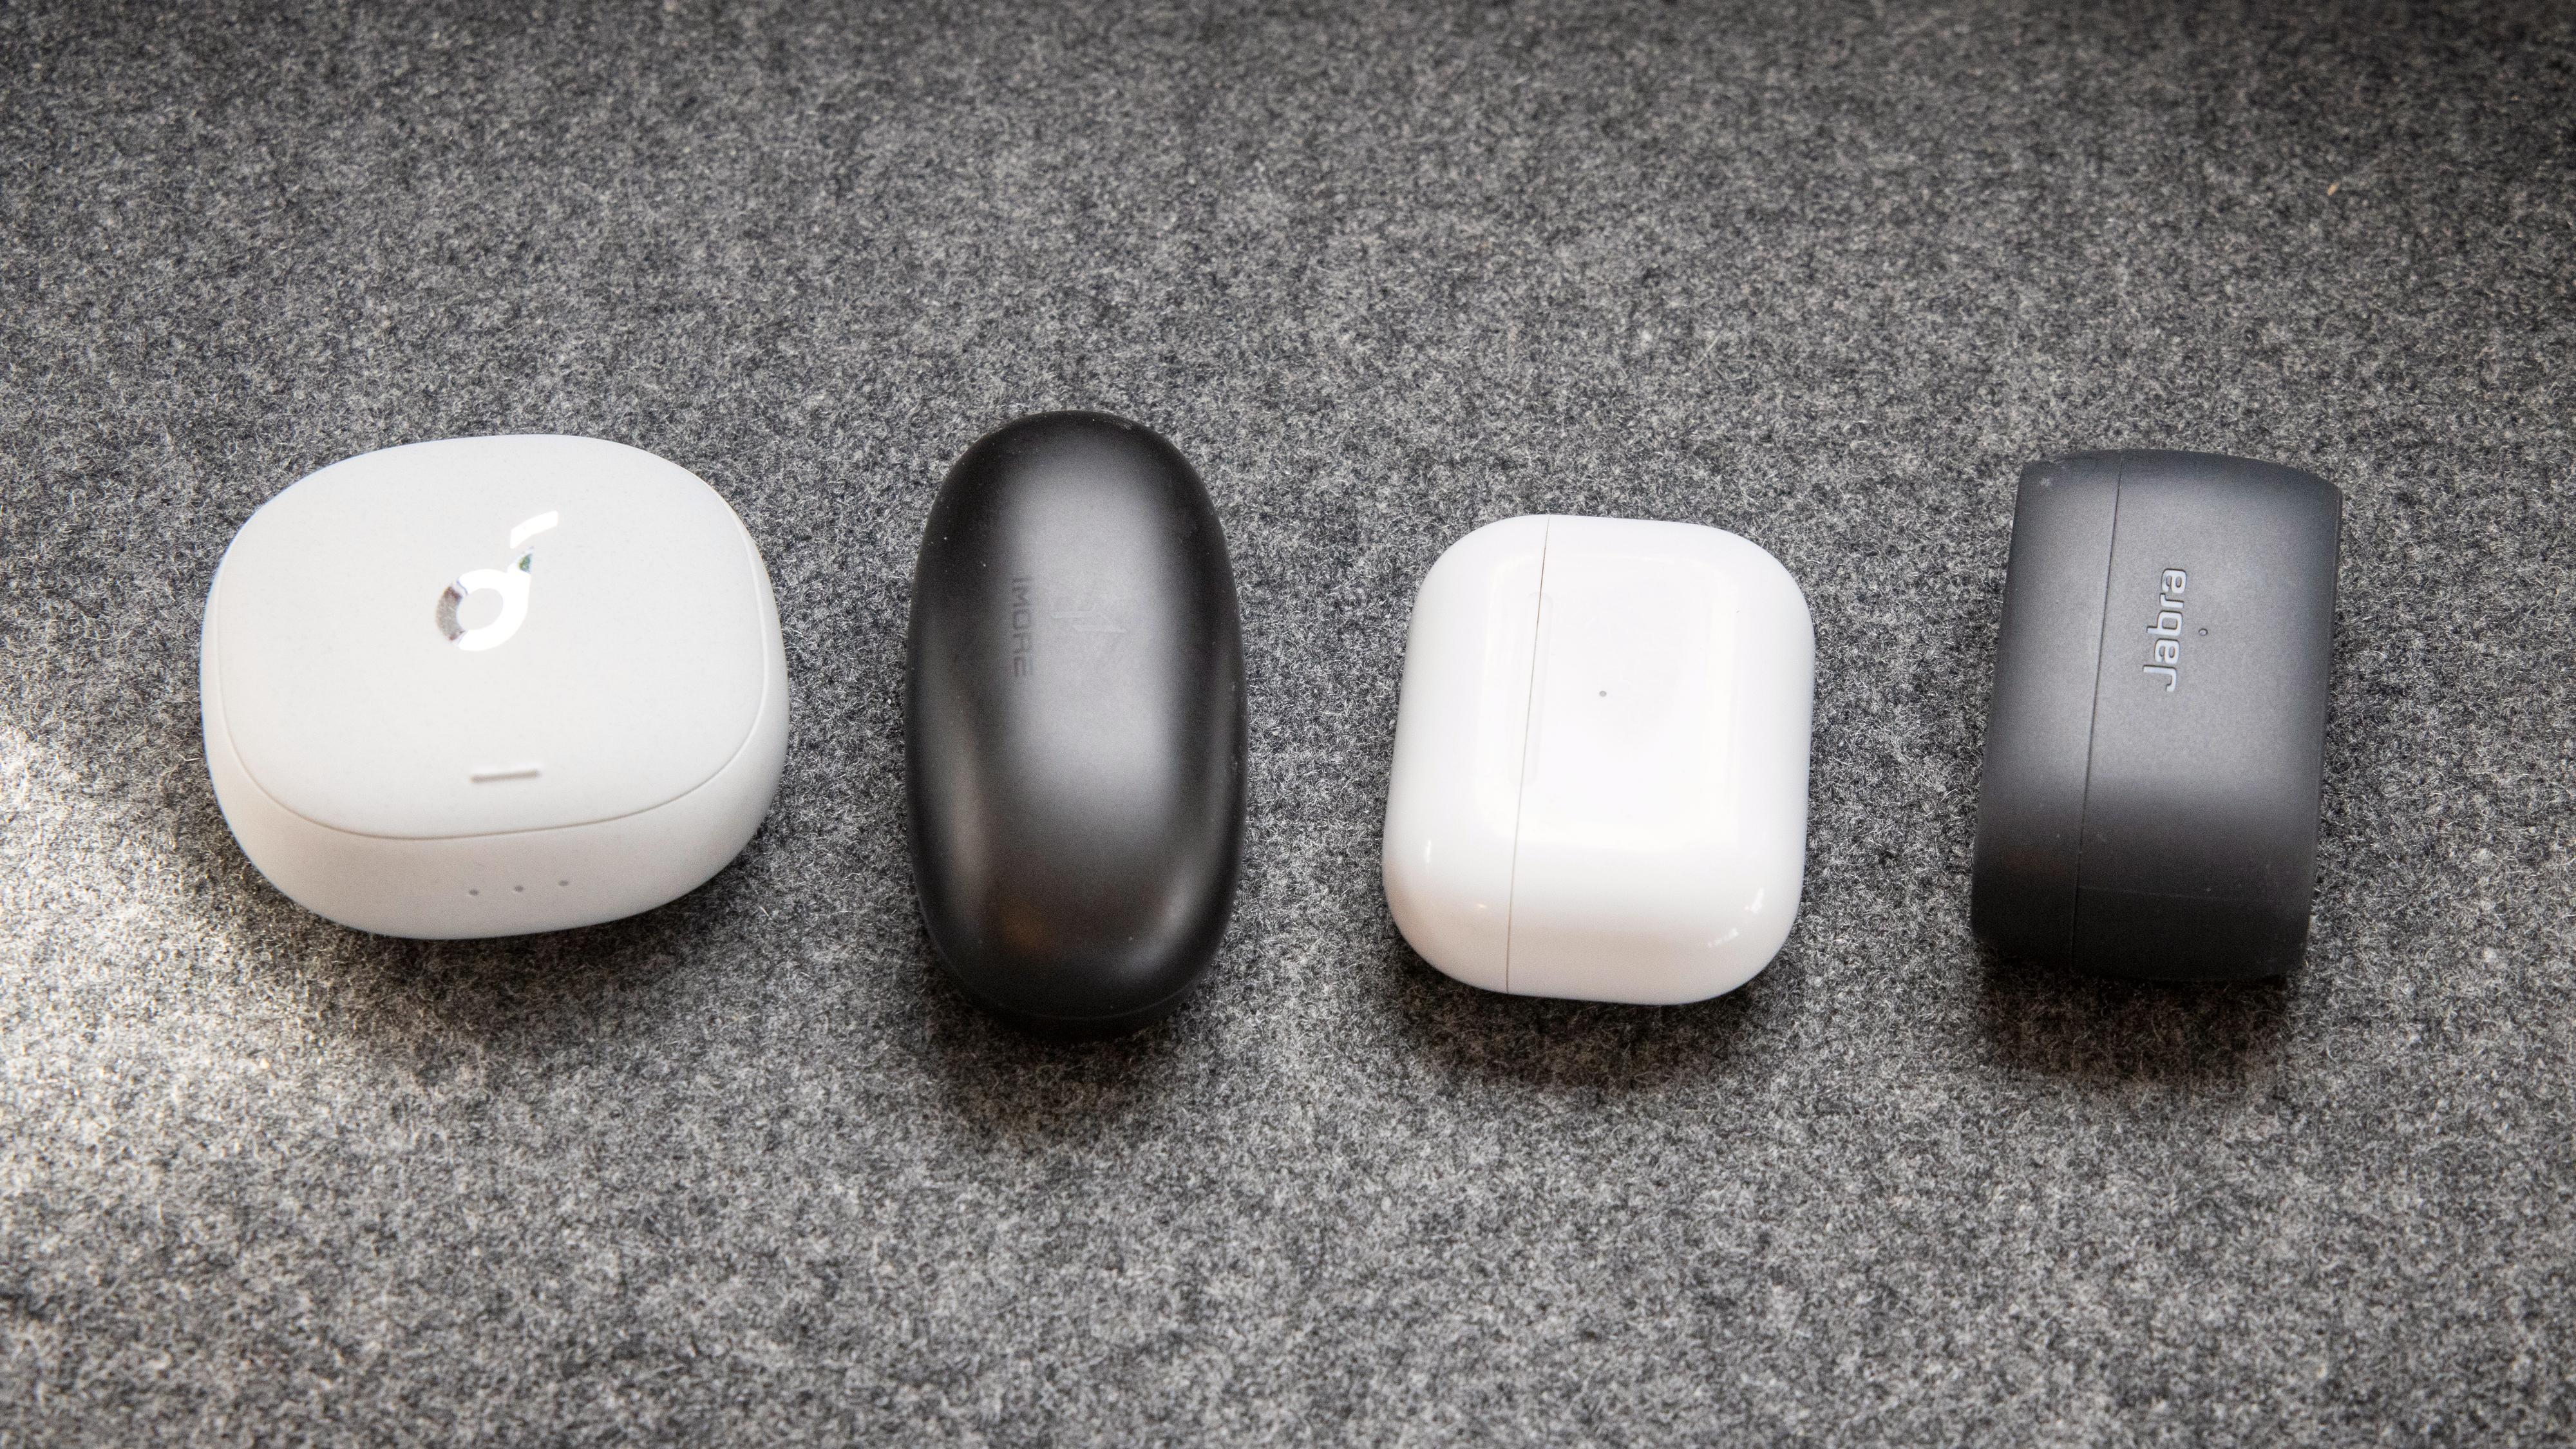 Fra venstre: Soundcore Liberty Air 2 Pro, 1More ComfoBuds Pro, Apple AirPods Pro og Jabra Elite 3.